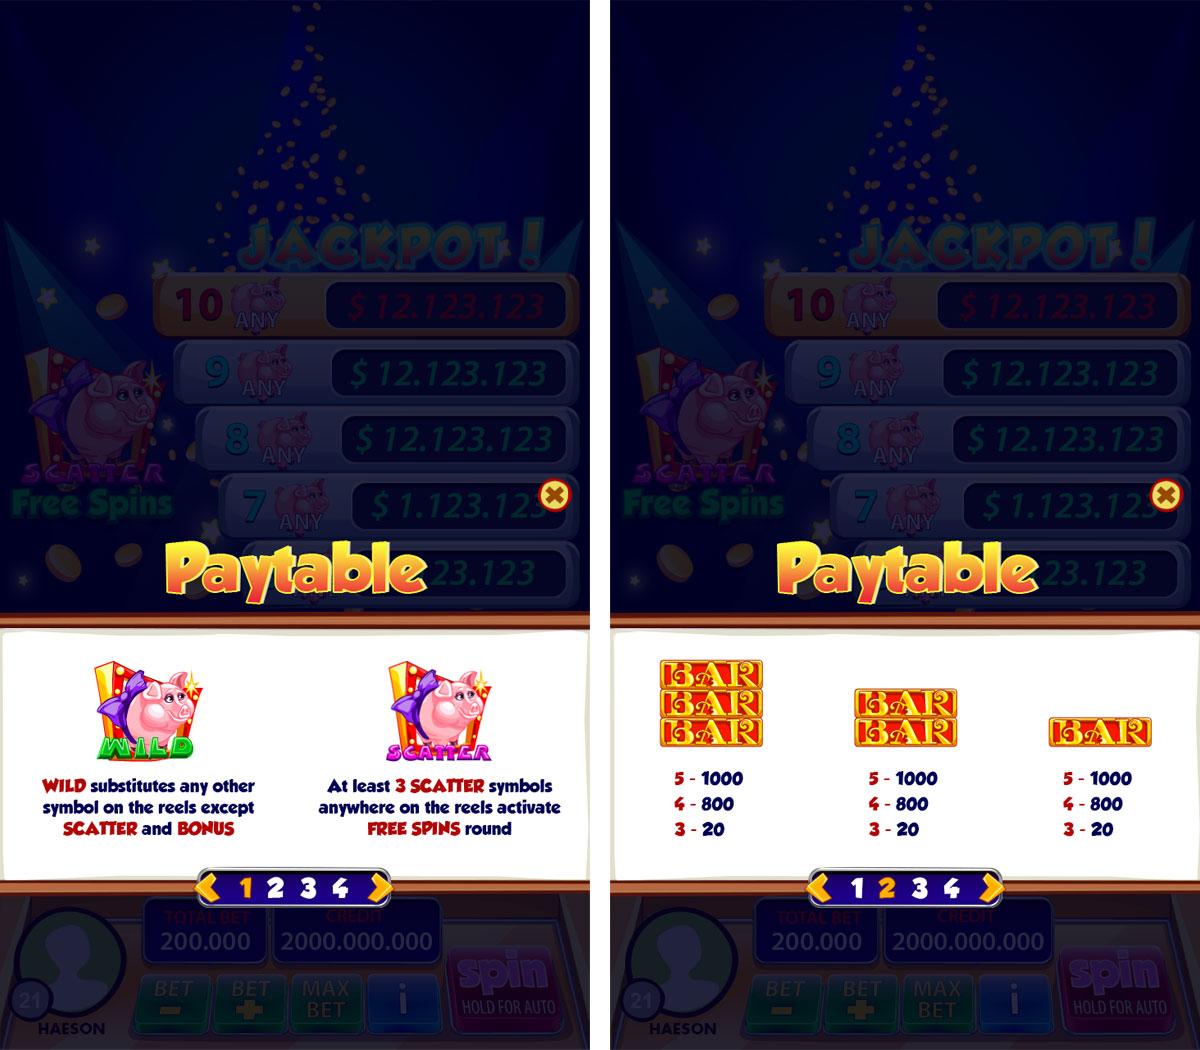 lucky_piggy_blog_paytables-1